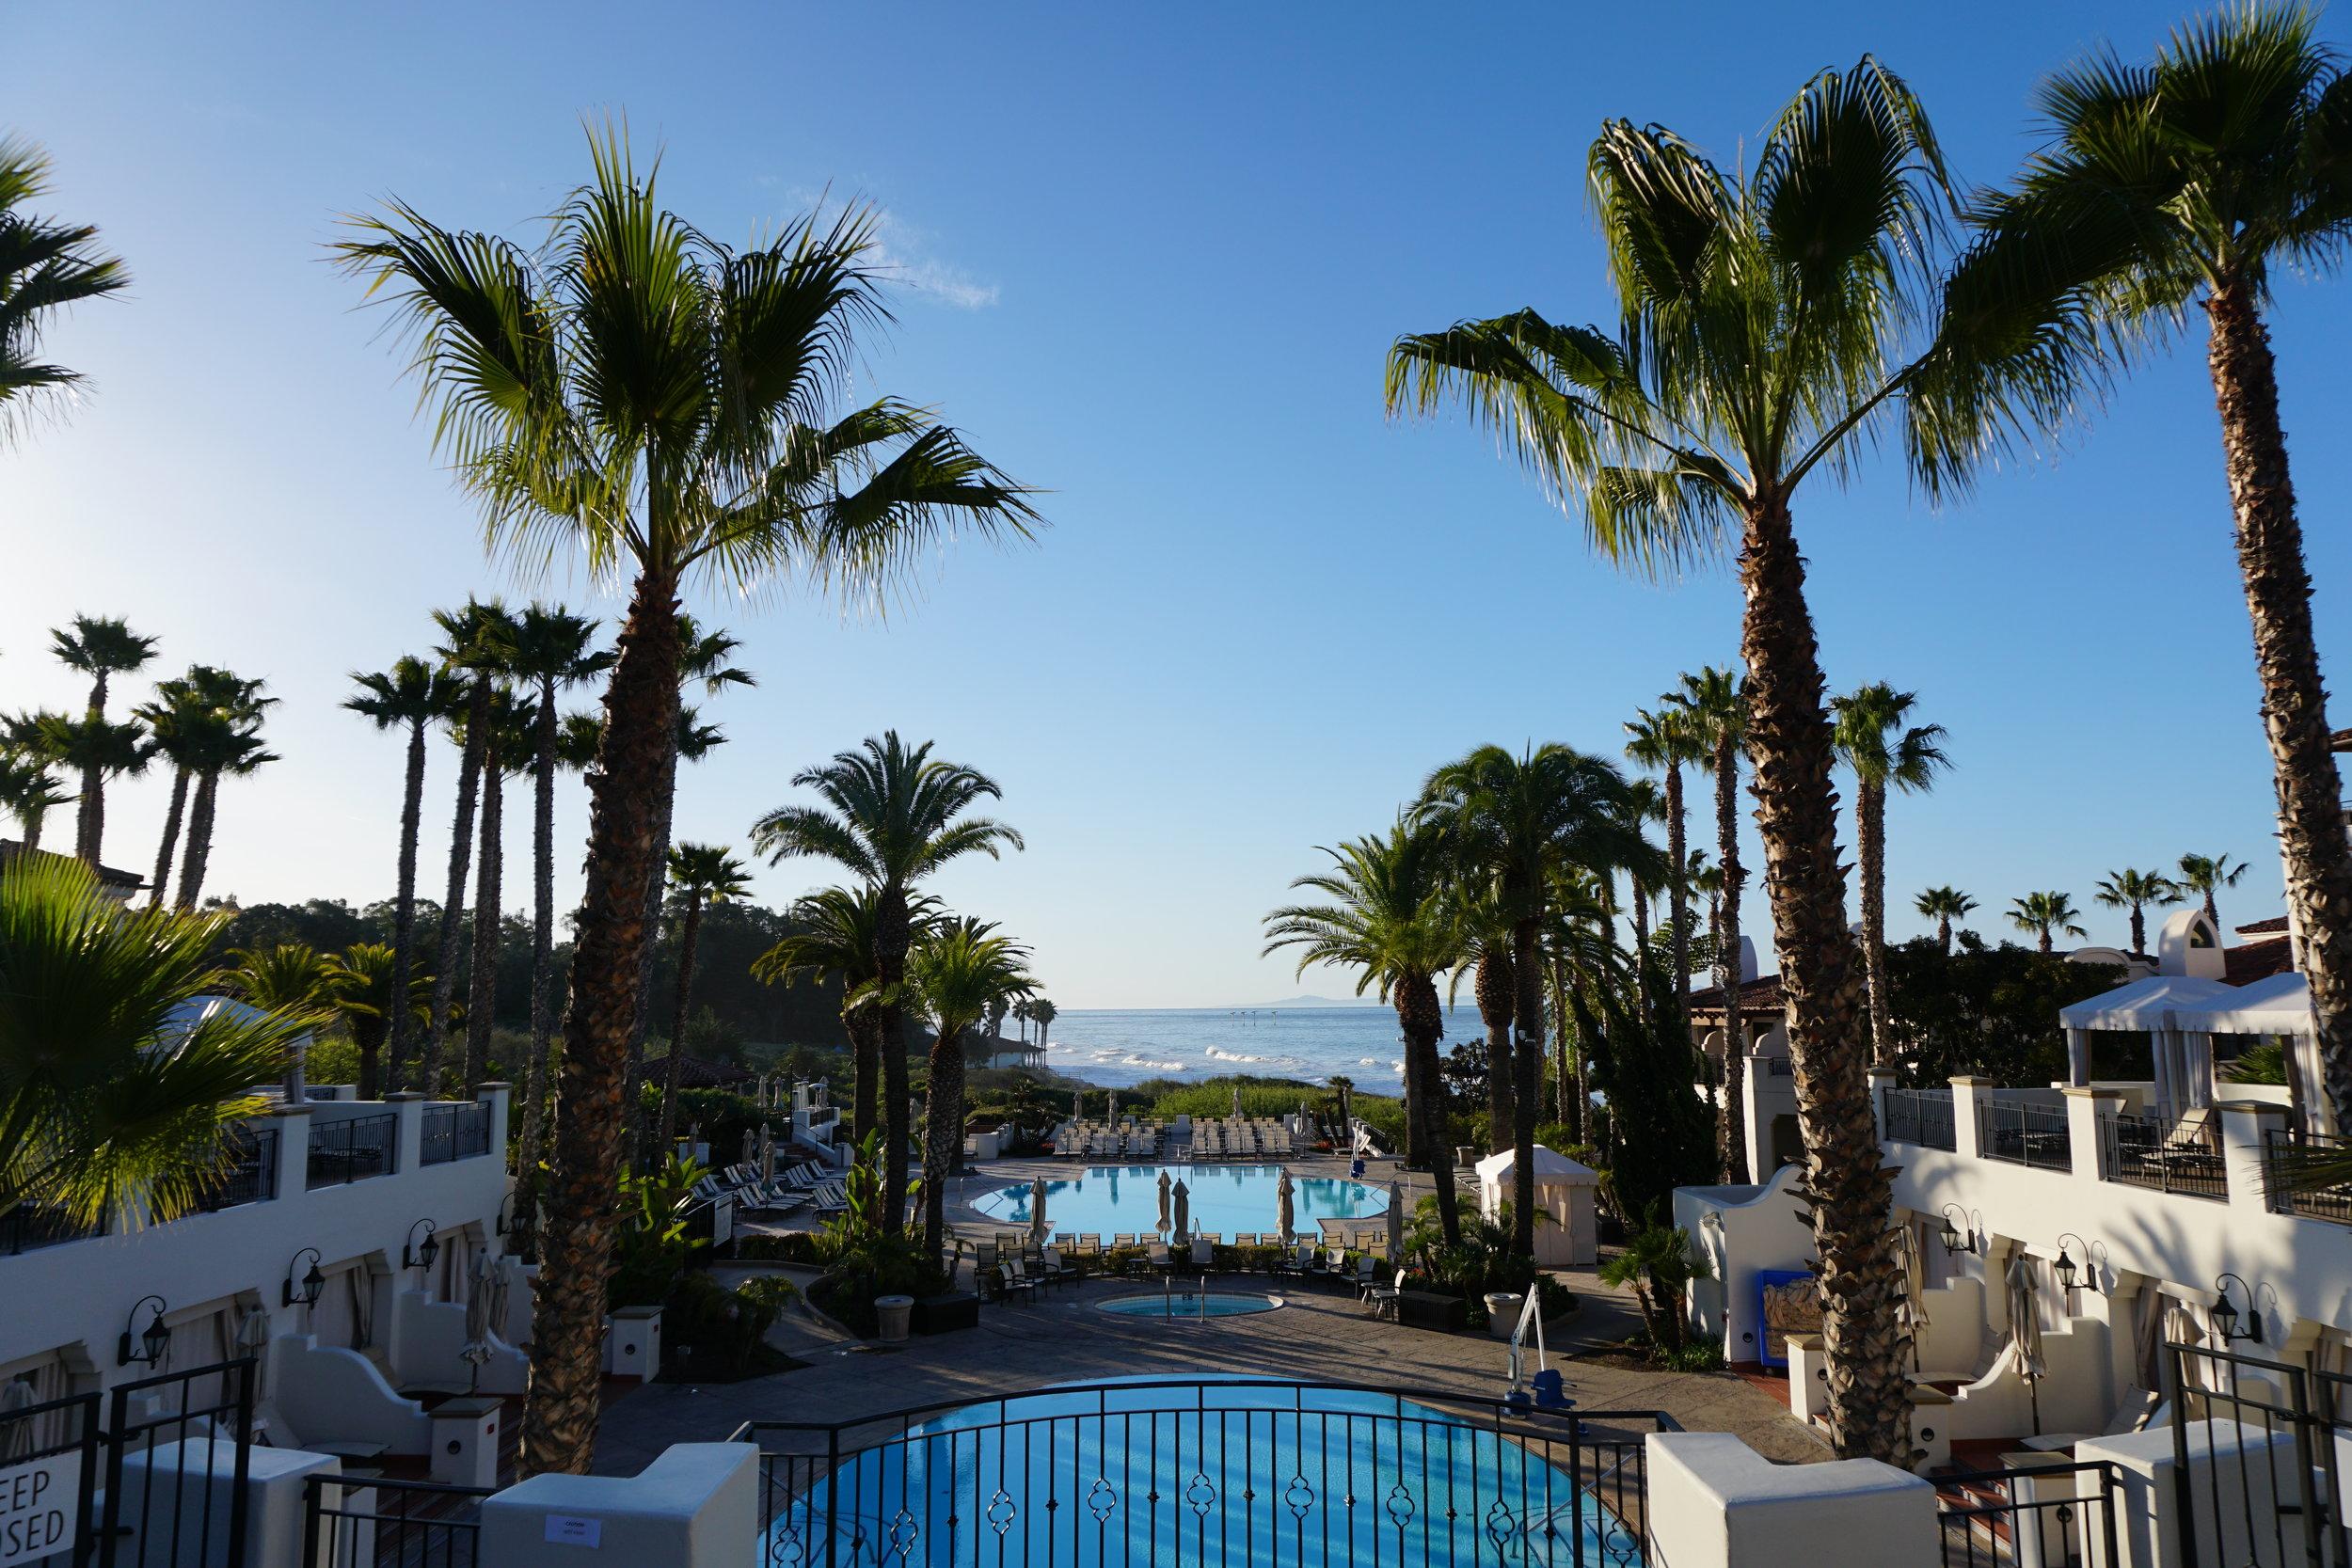 The main pool with an ocean view at the Bacara Resort & Spa in Santa Barbara.